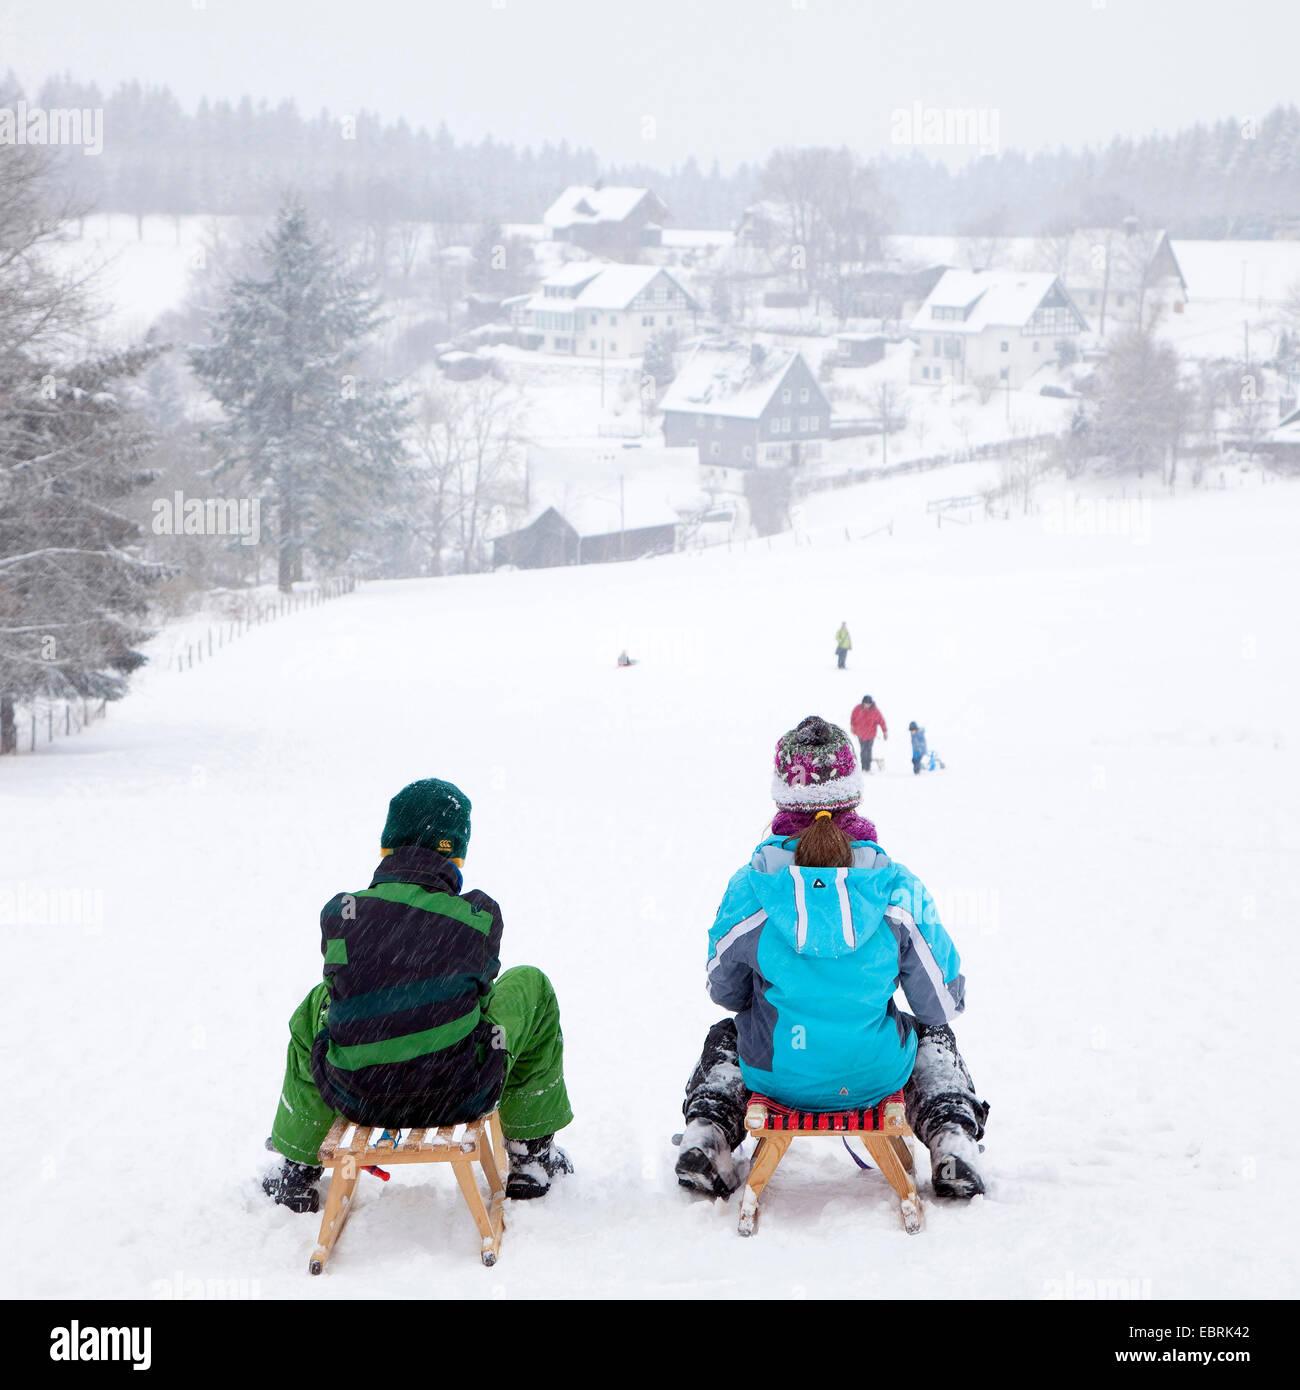 two kids on a piste in snowy landscape in Schanze, Germany, North Rhine-Westphalia, Sauerland, Schmallenberg - Stock Image